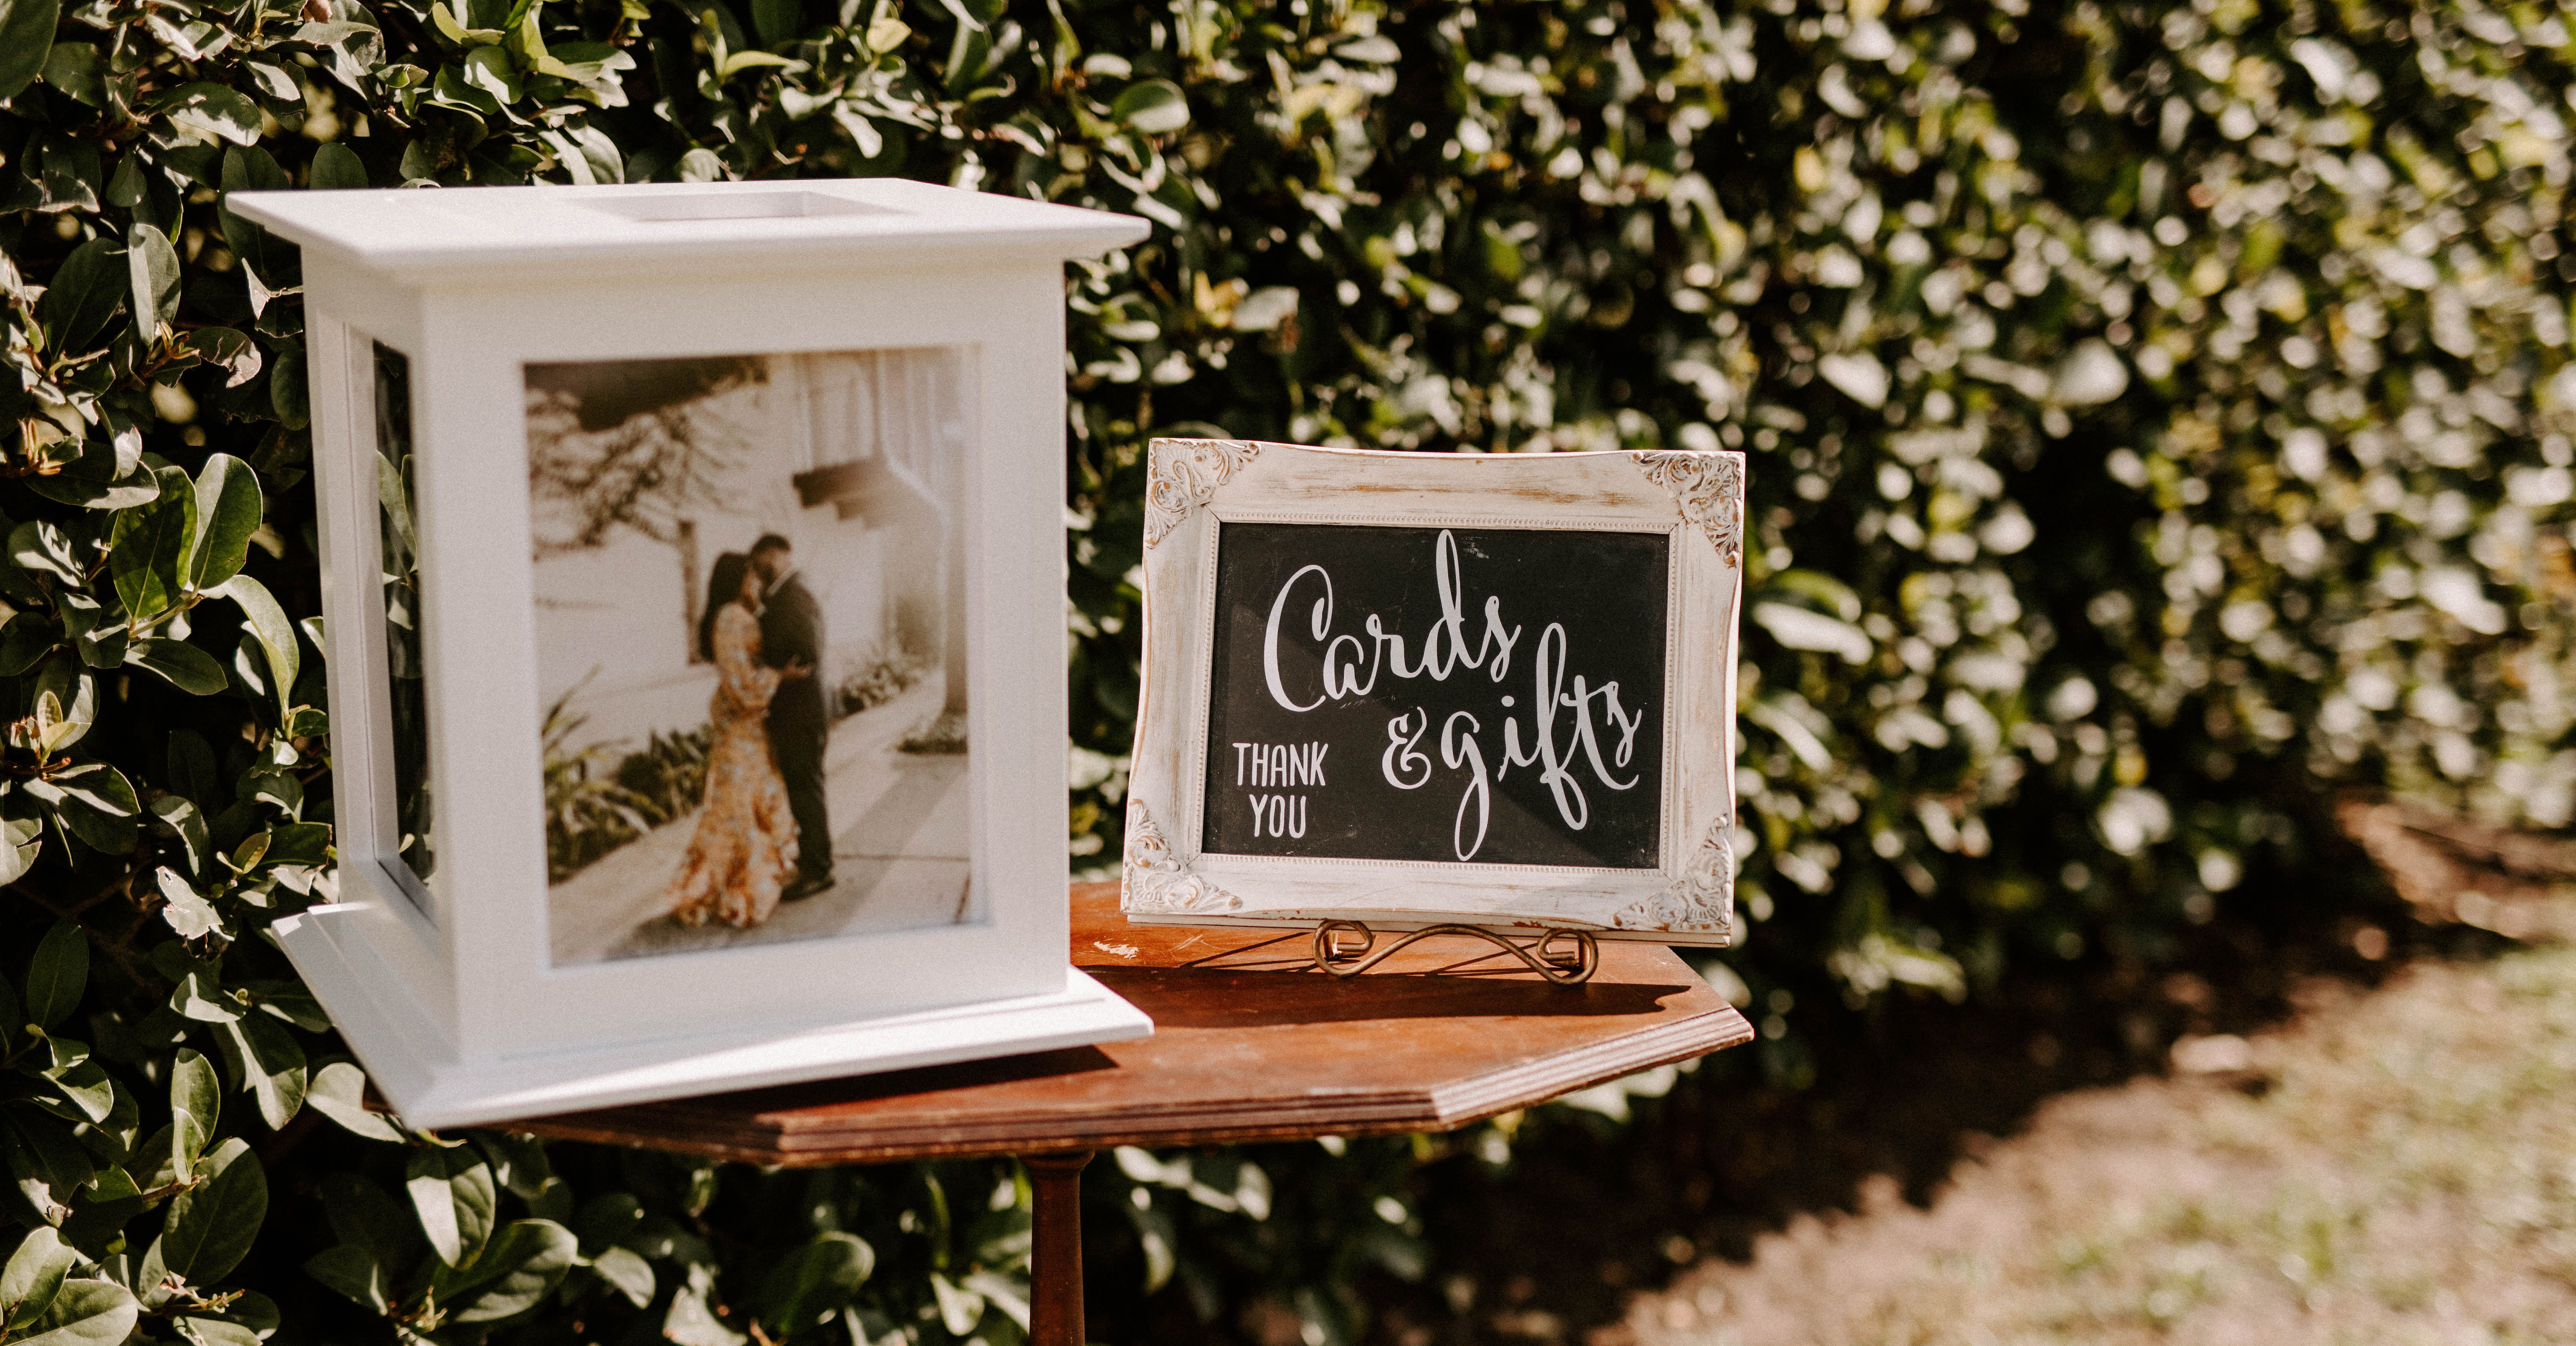 Heart Shaped Photoholder Shabby Chic Photo Card Holder Picture Frame Decor